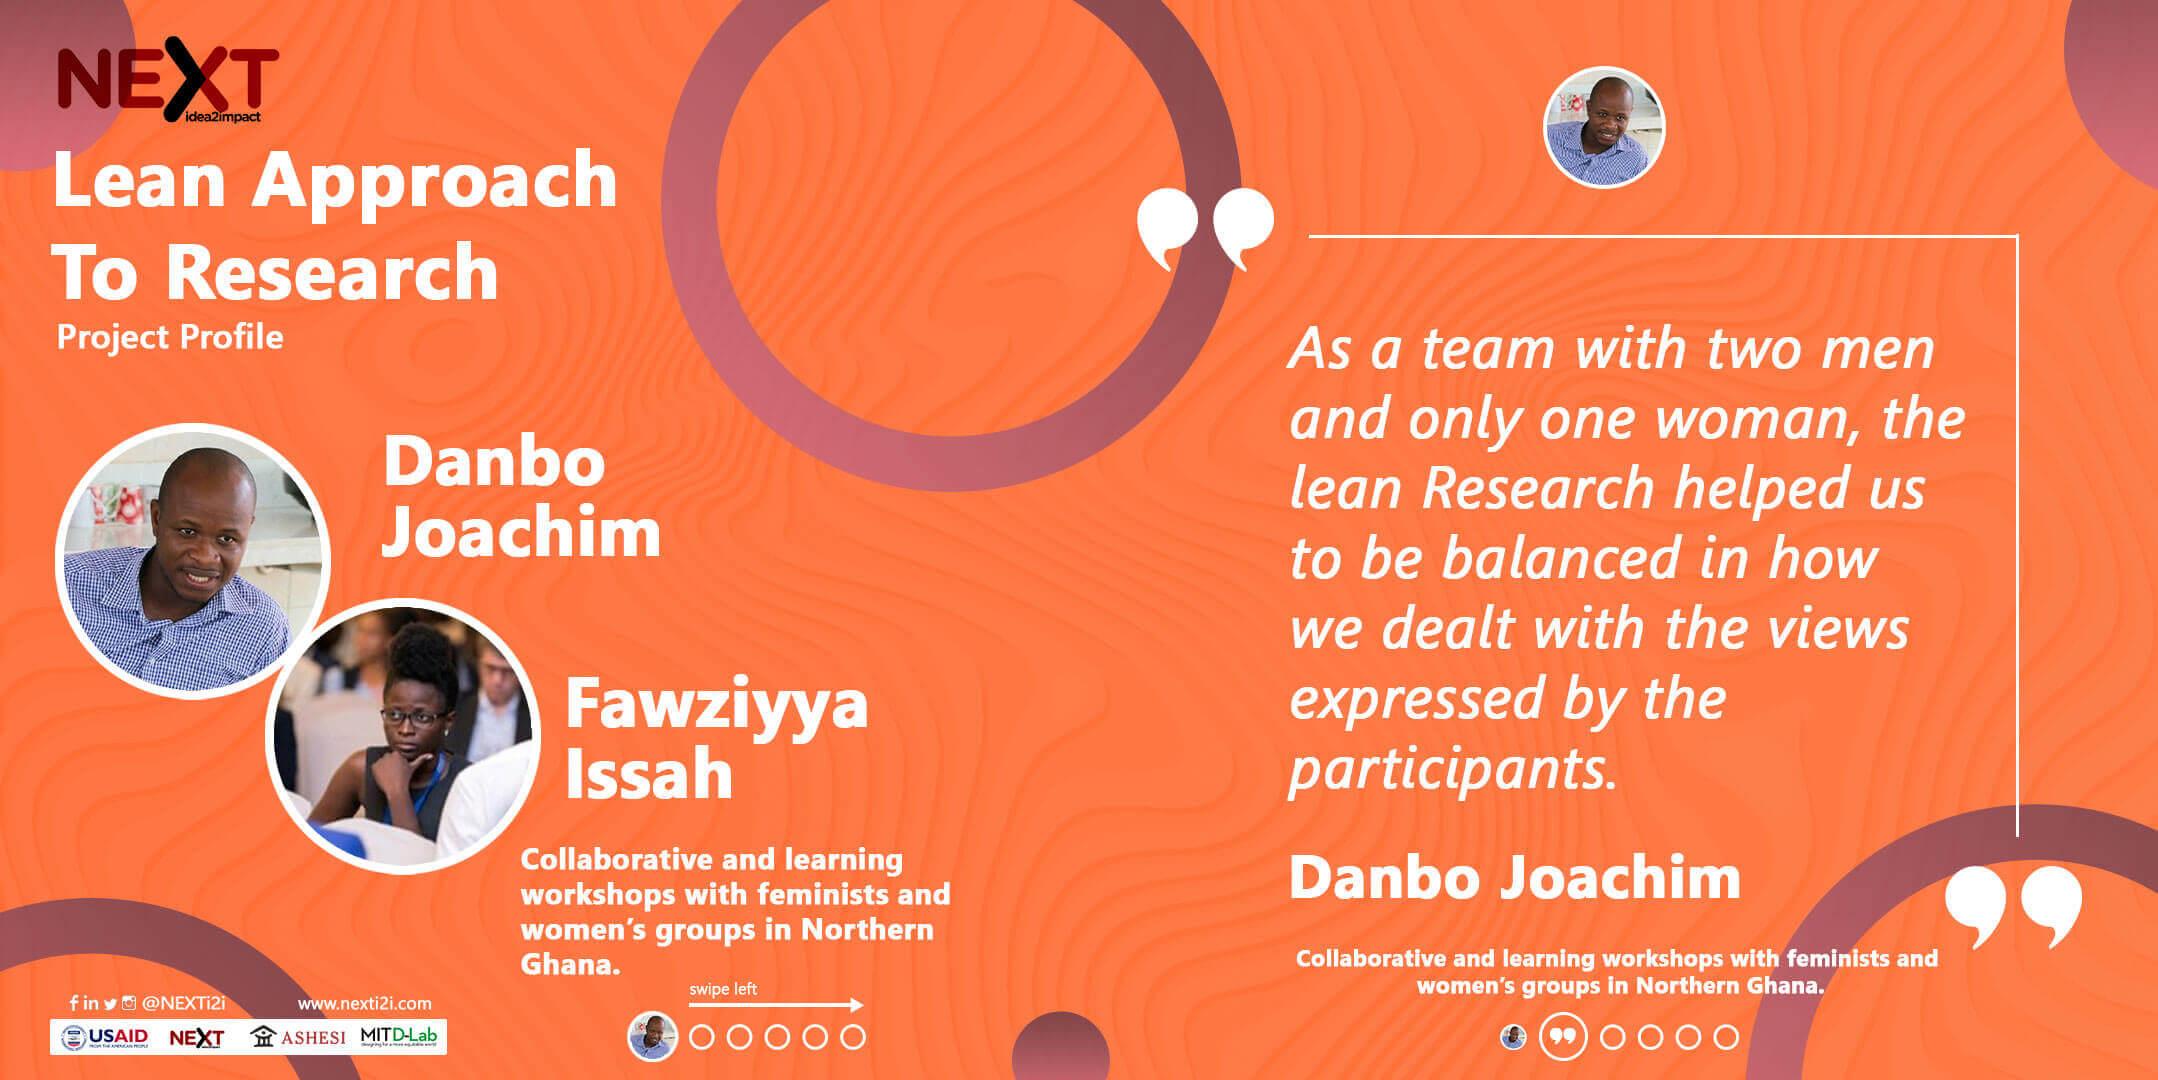 Ashesi Lean Research | Danbo